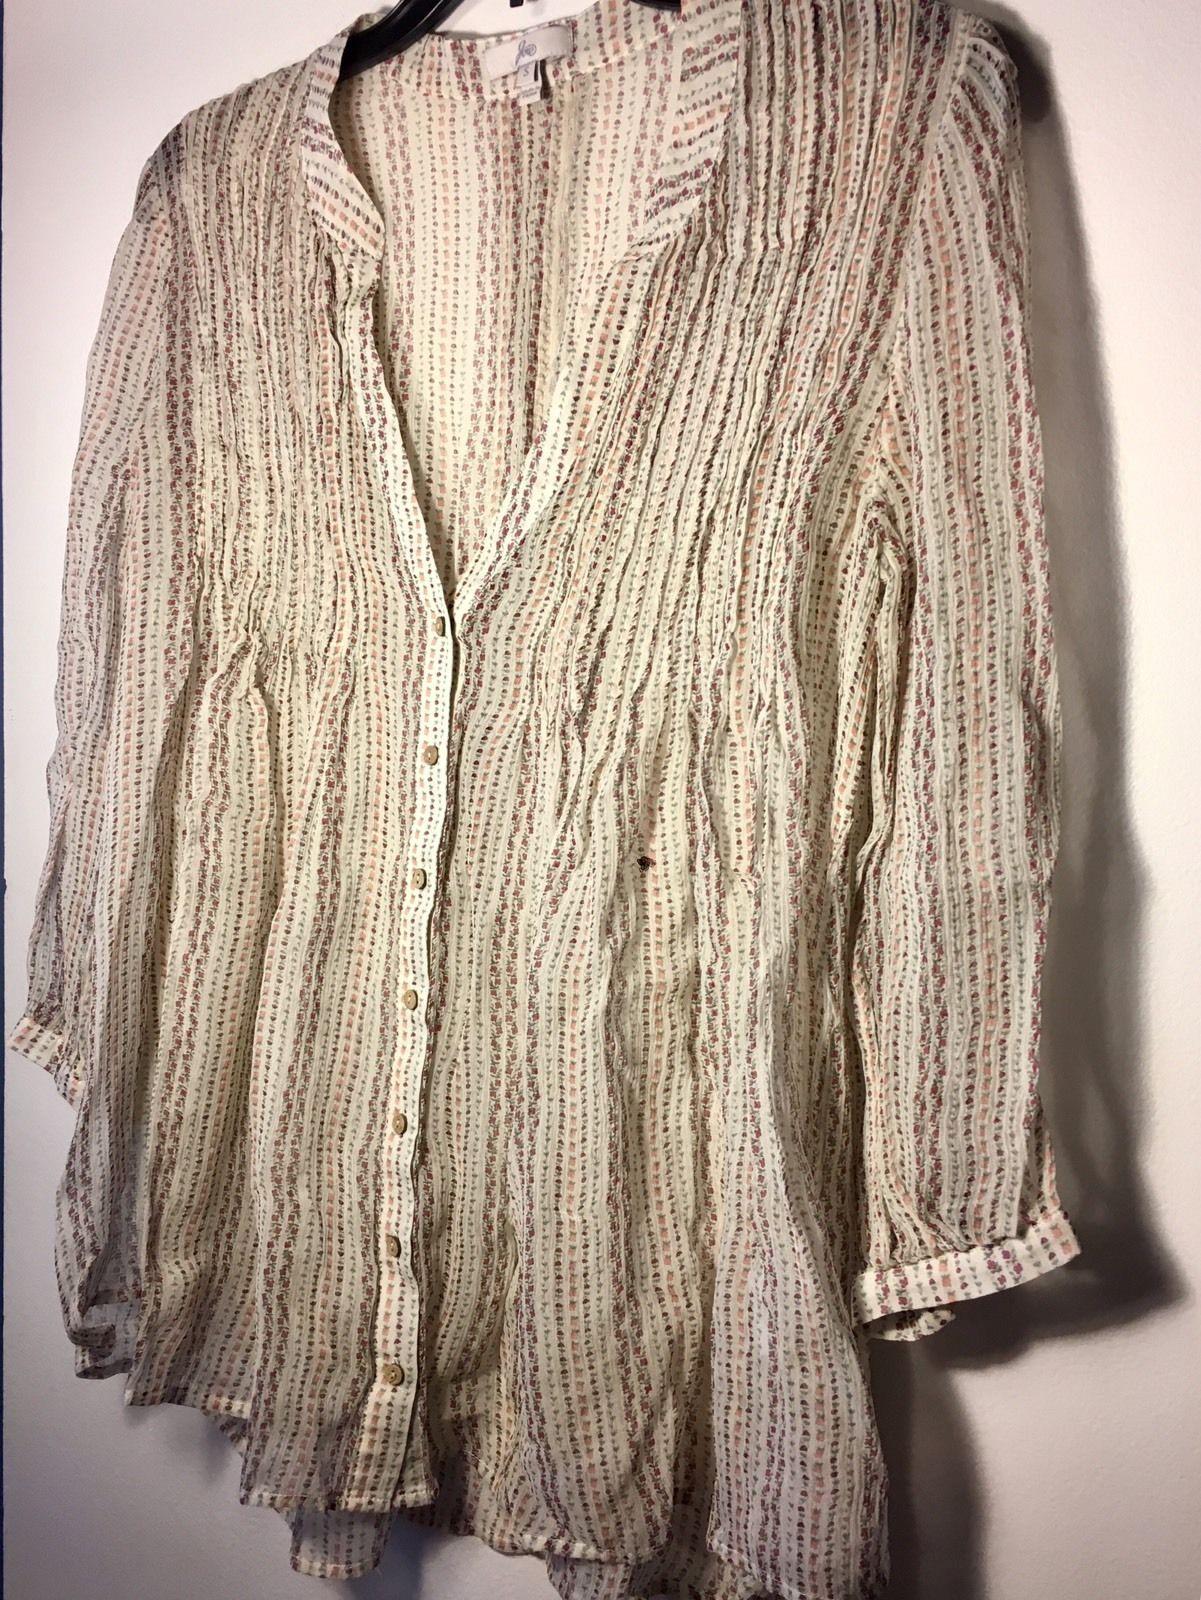 JOIE Women's Floral Stripe 100% Silk Blouse $278 RV Size Small (S) | eBay